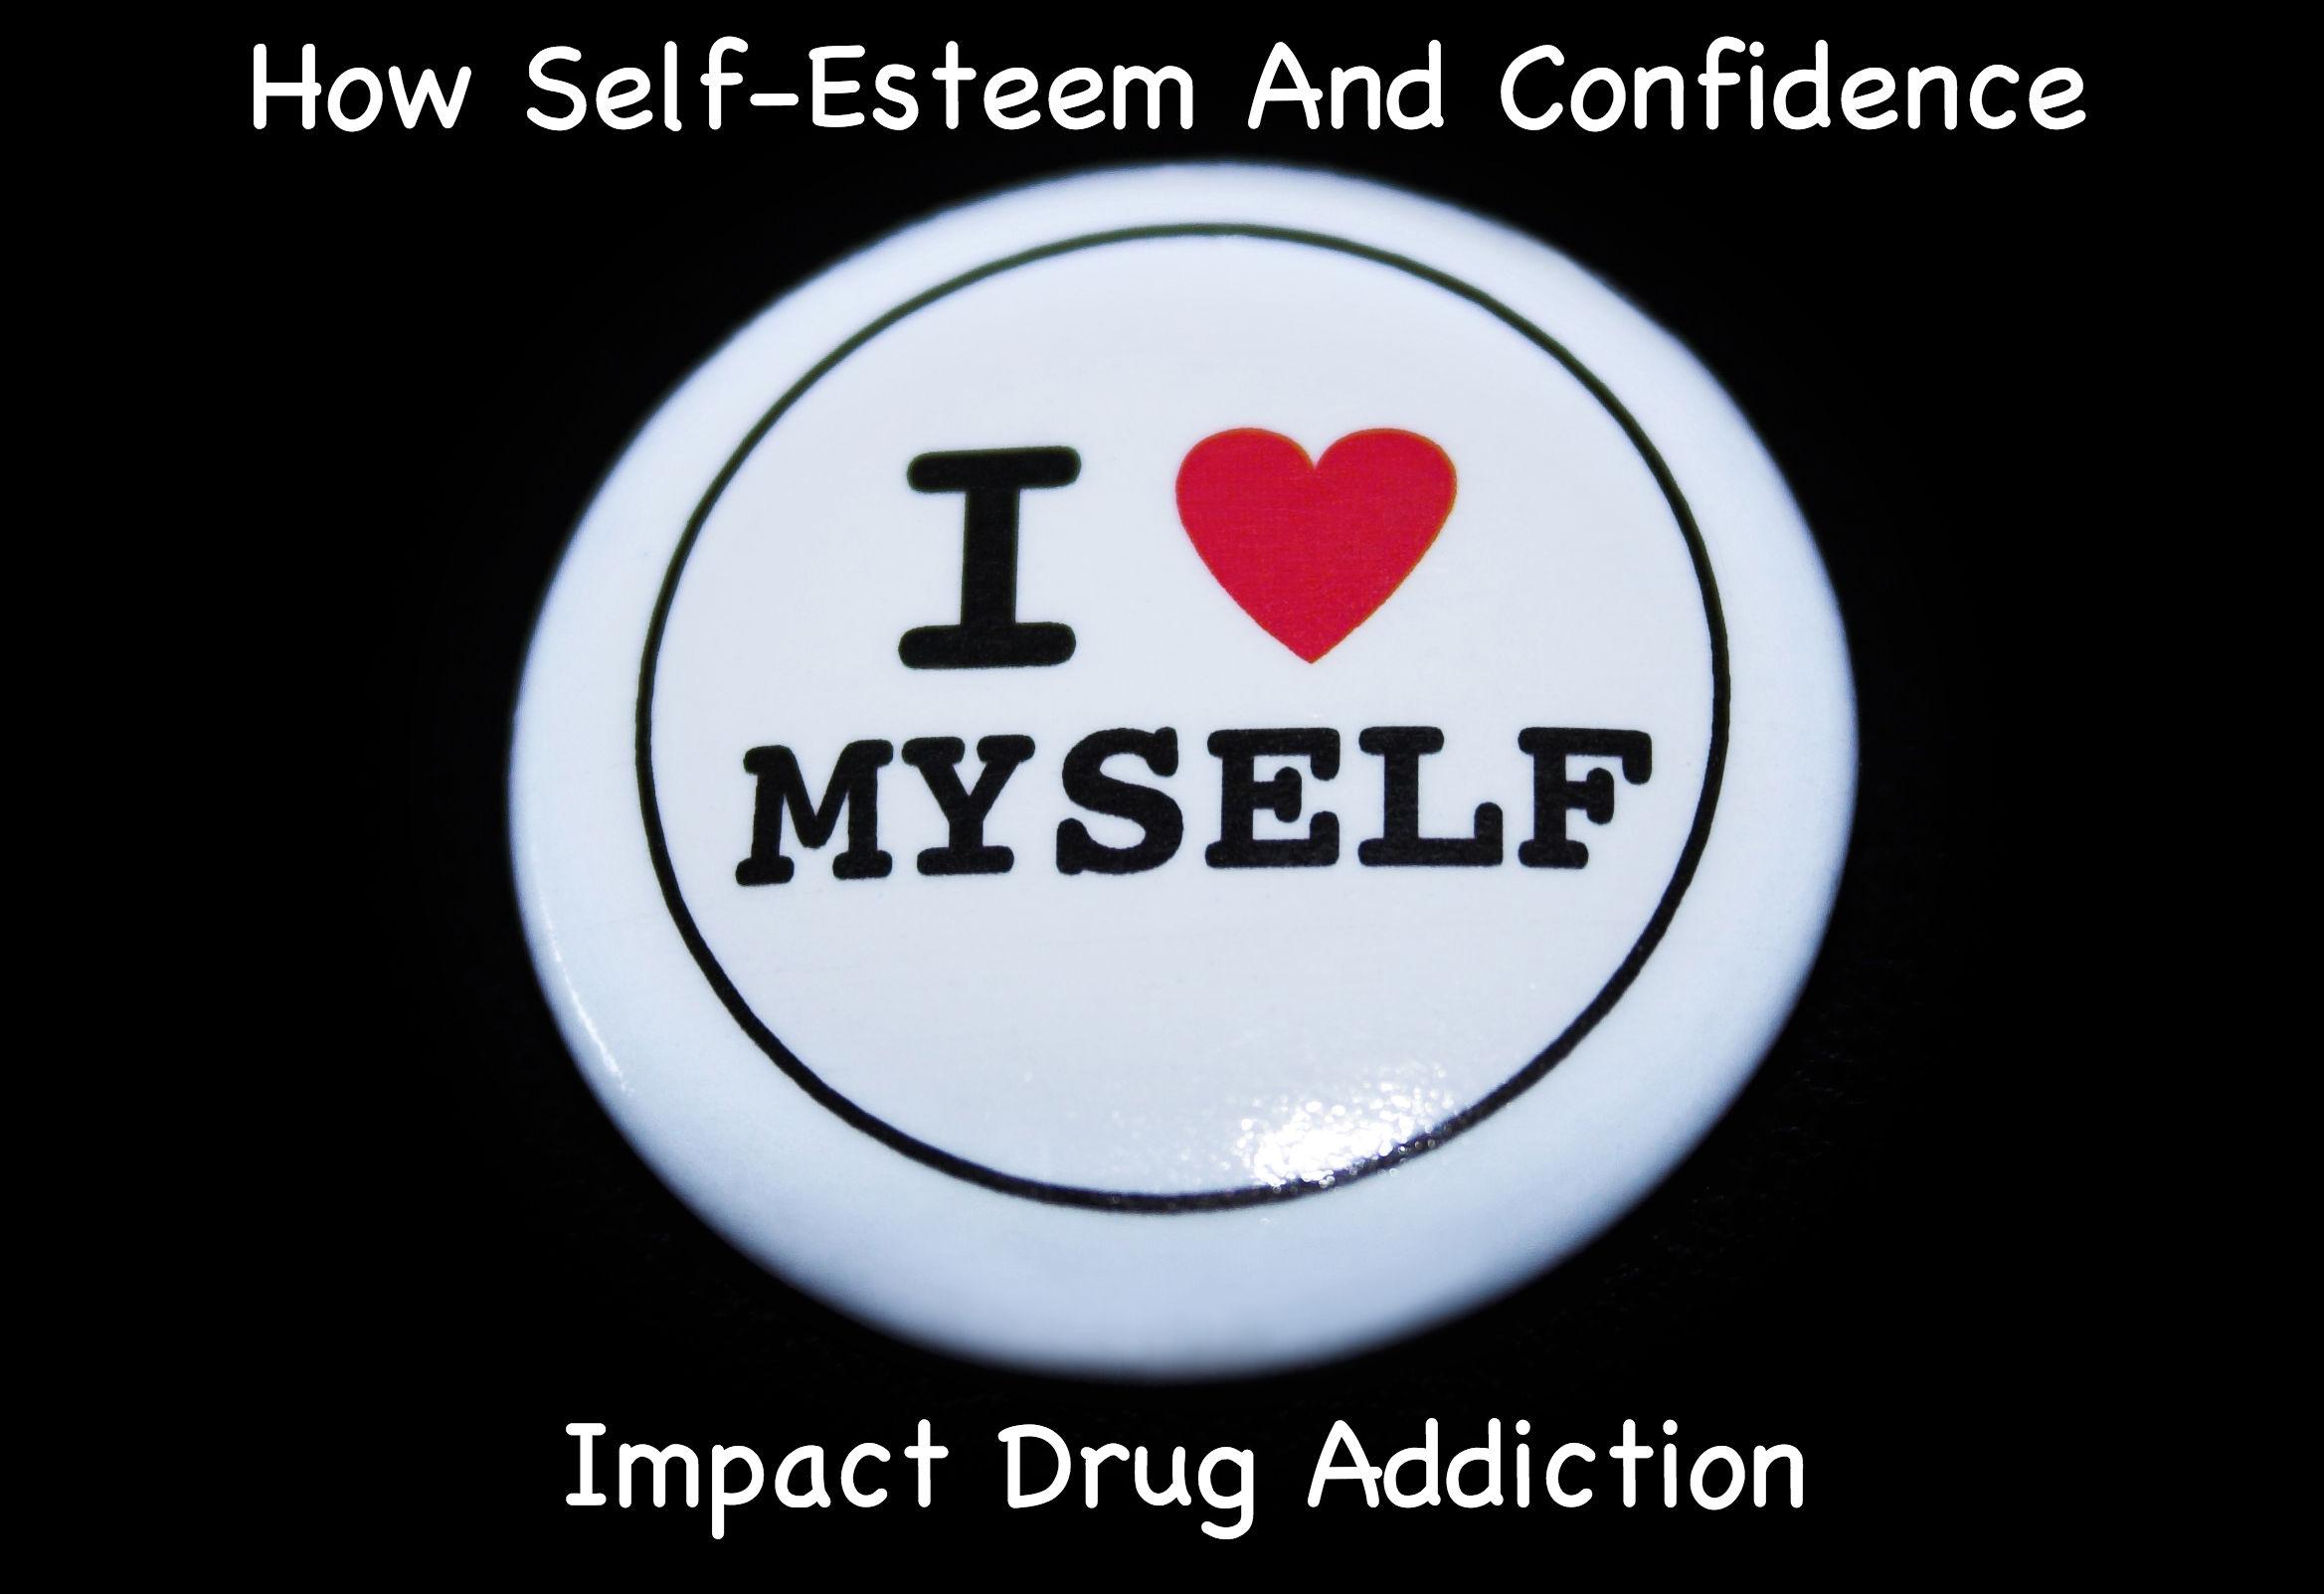 How Self Esteem And Confidence Impact Drug Addiction